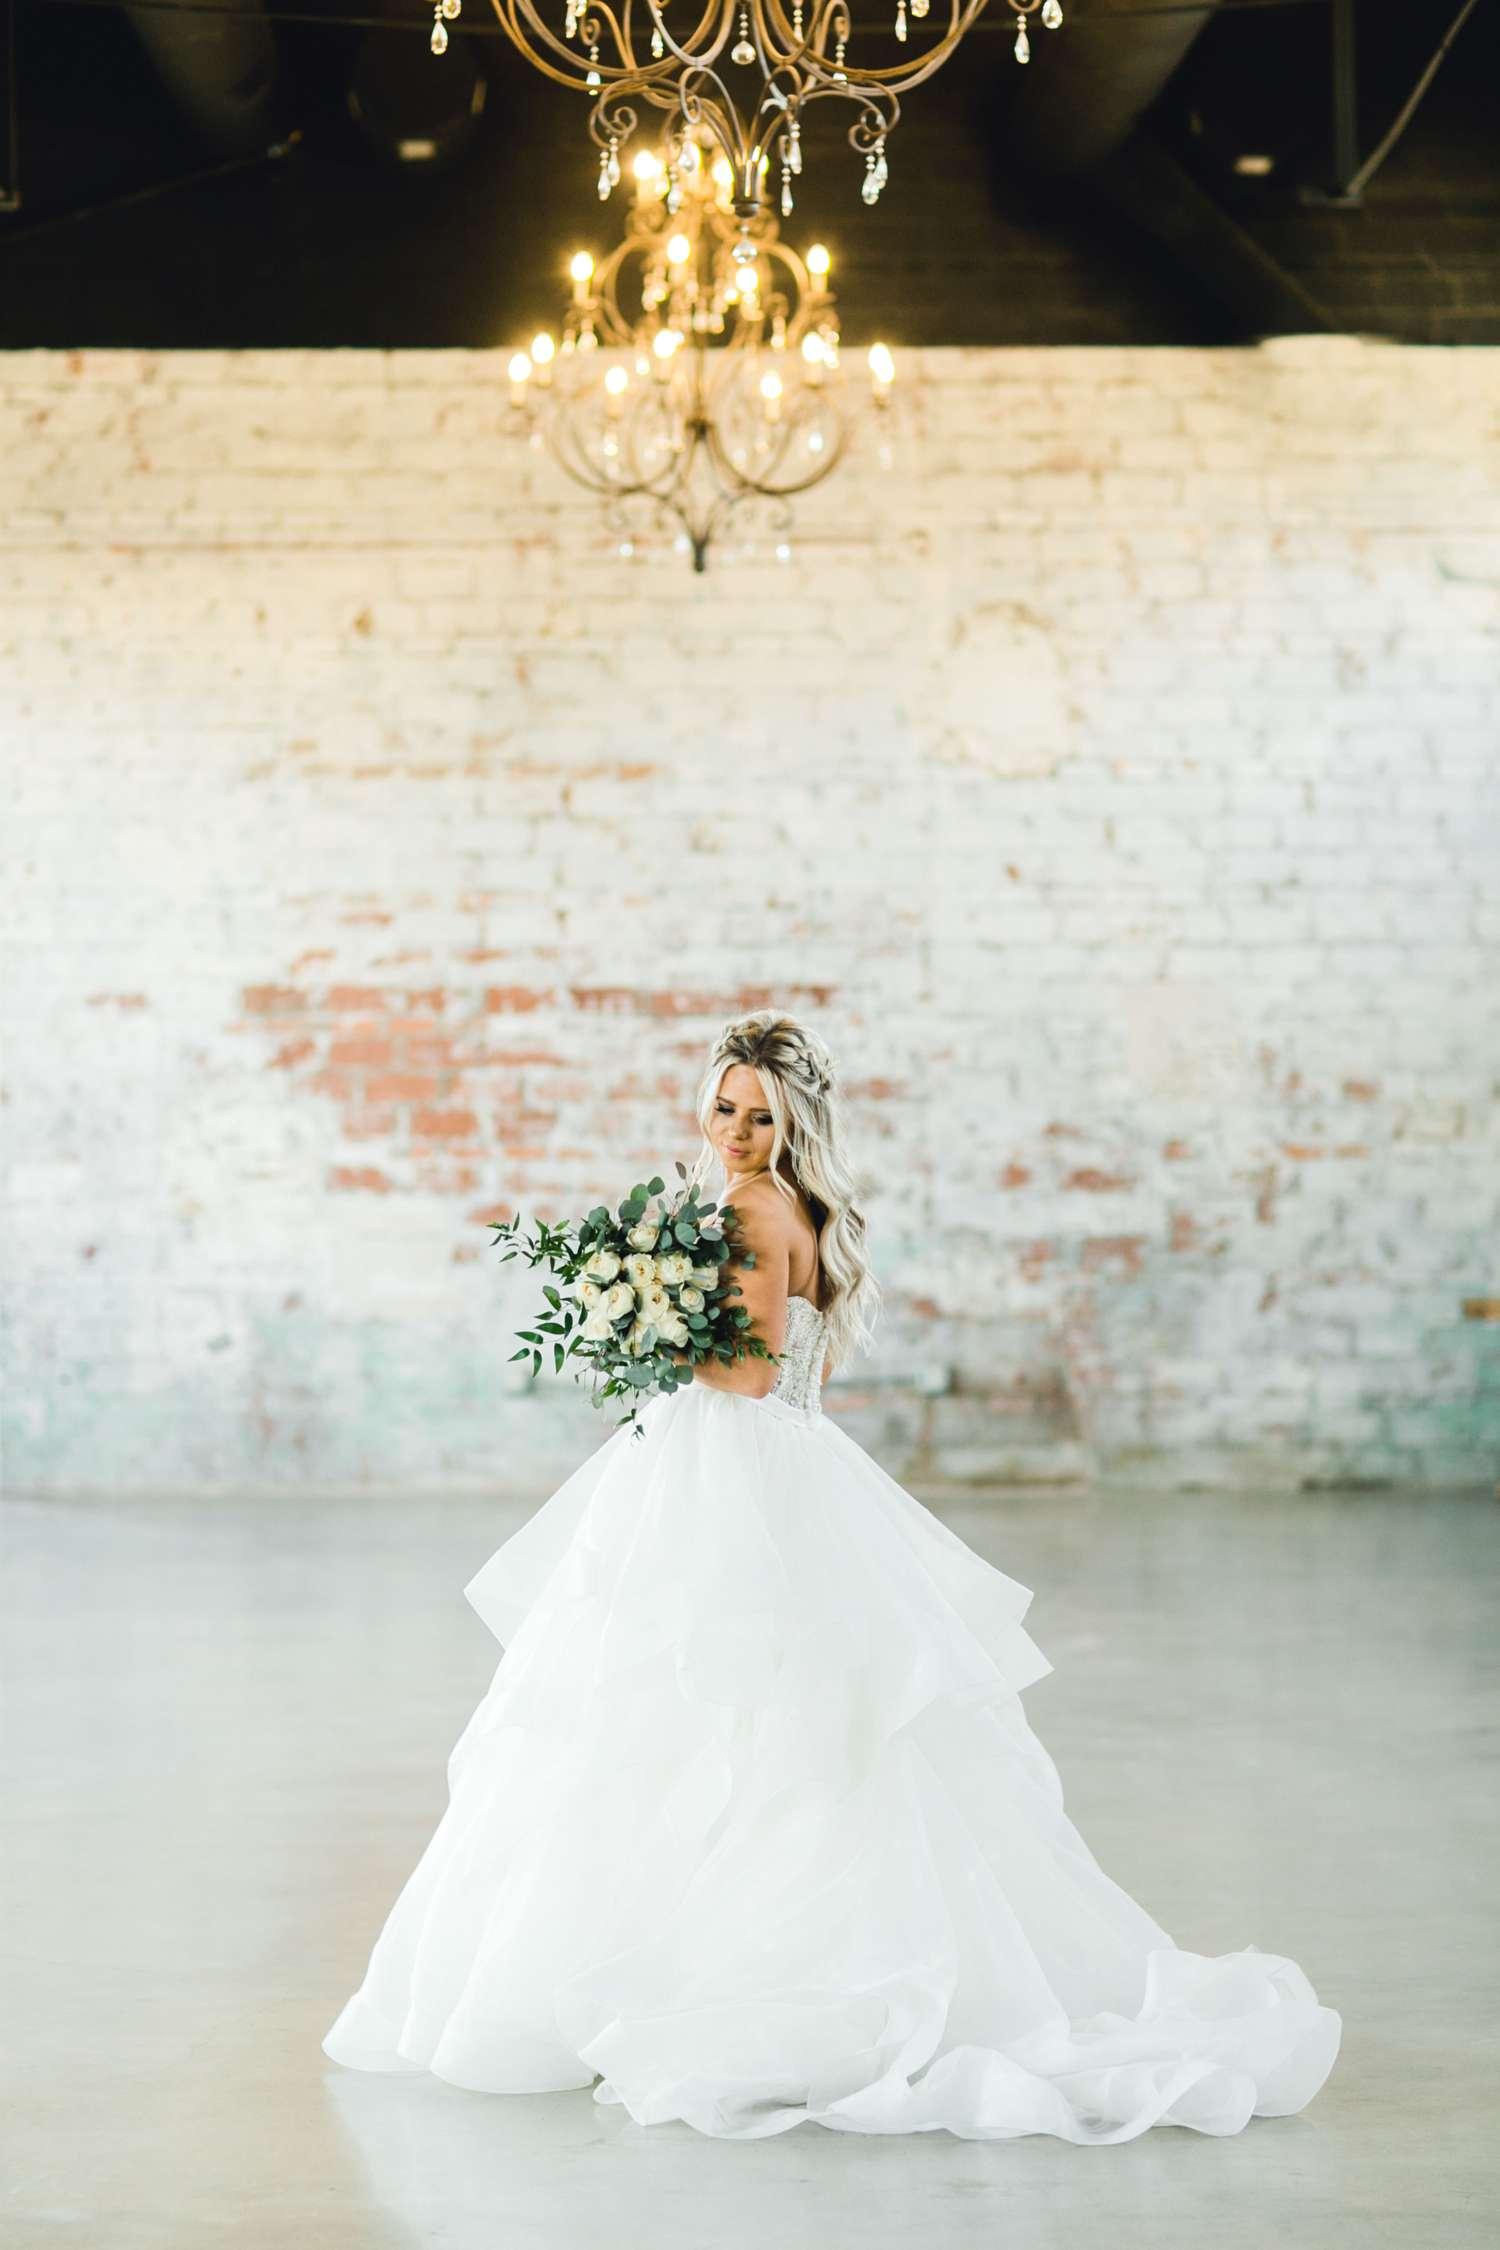 HAYLEE_DAVIS_ALLEEJ_LUBBOCK_WEDDING_PHOTOGRAPHER_BRIDALS_0017.jpg